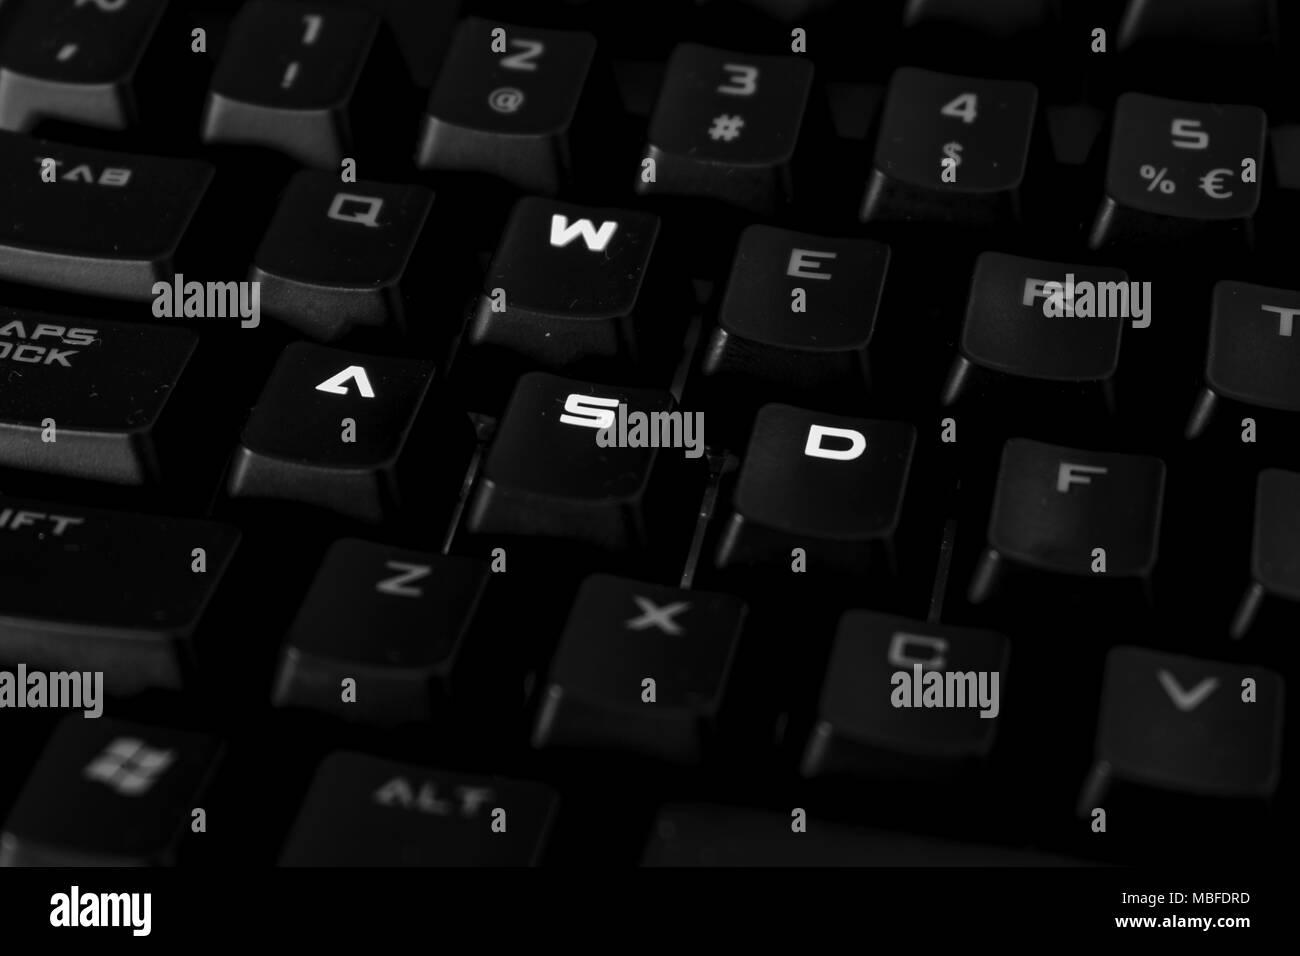 WASD keys on gaming keyboard close up, backlit keys - Stock Image